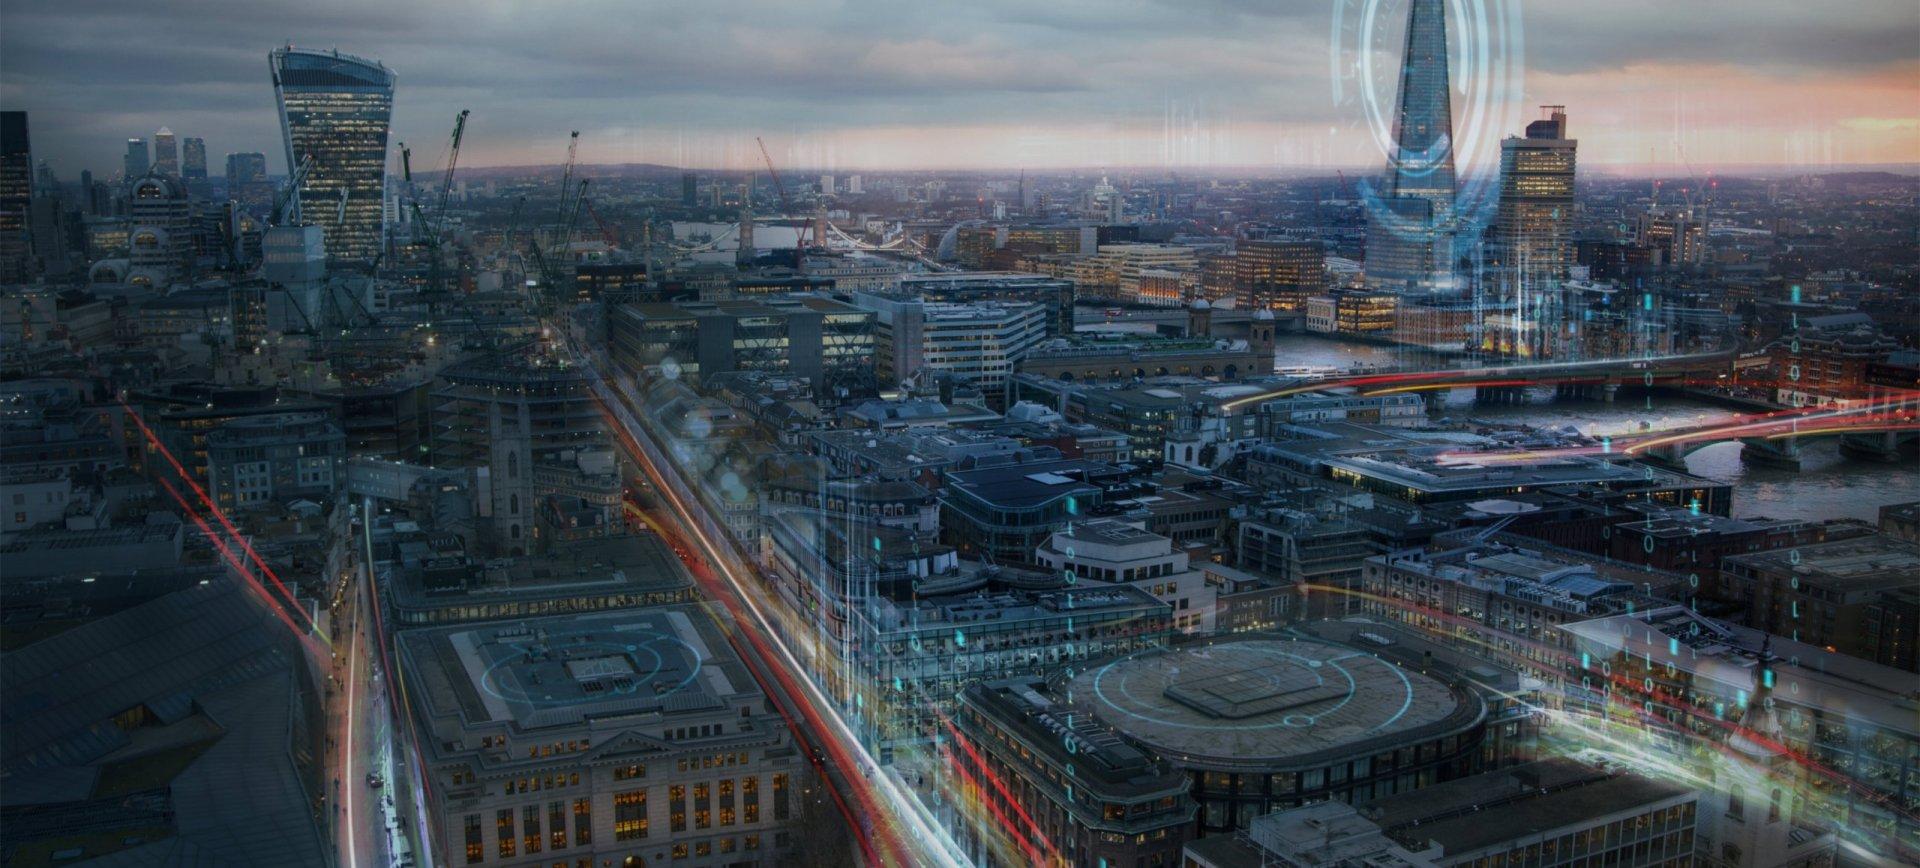 Digital skyline image of London